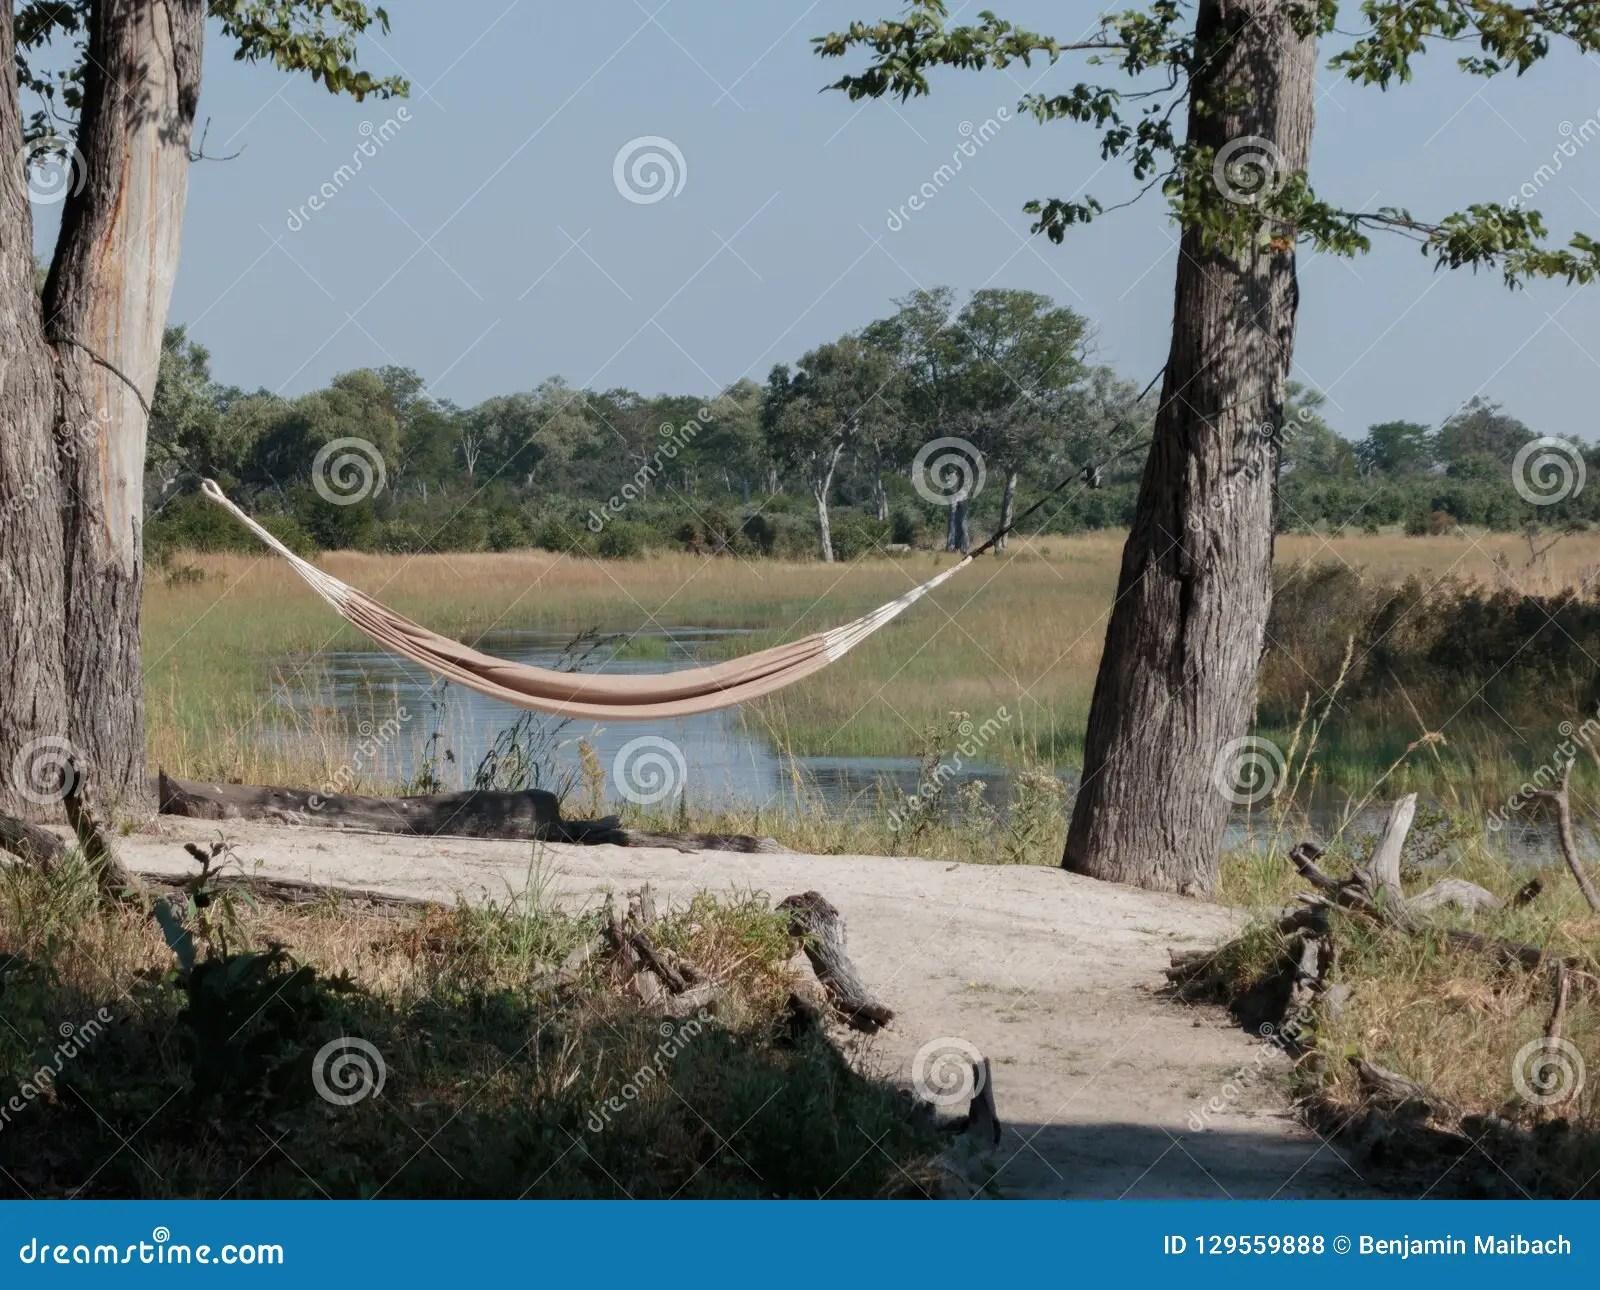 hammock between trees in